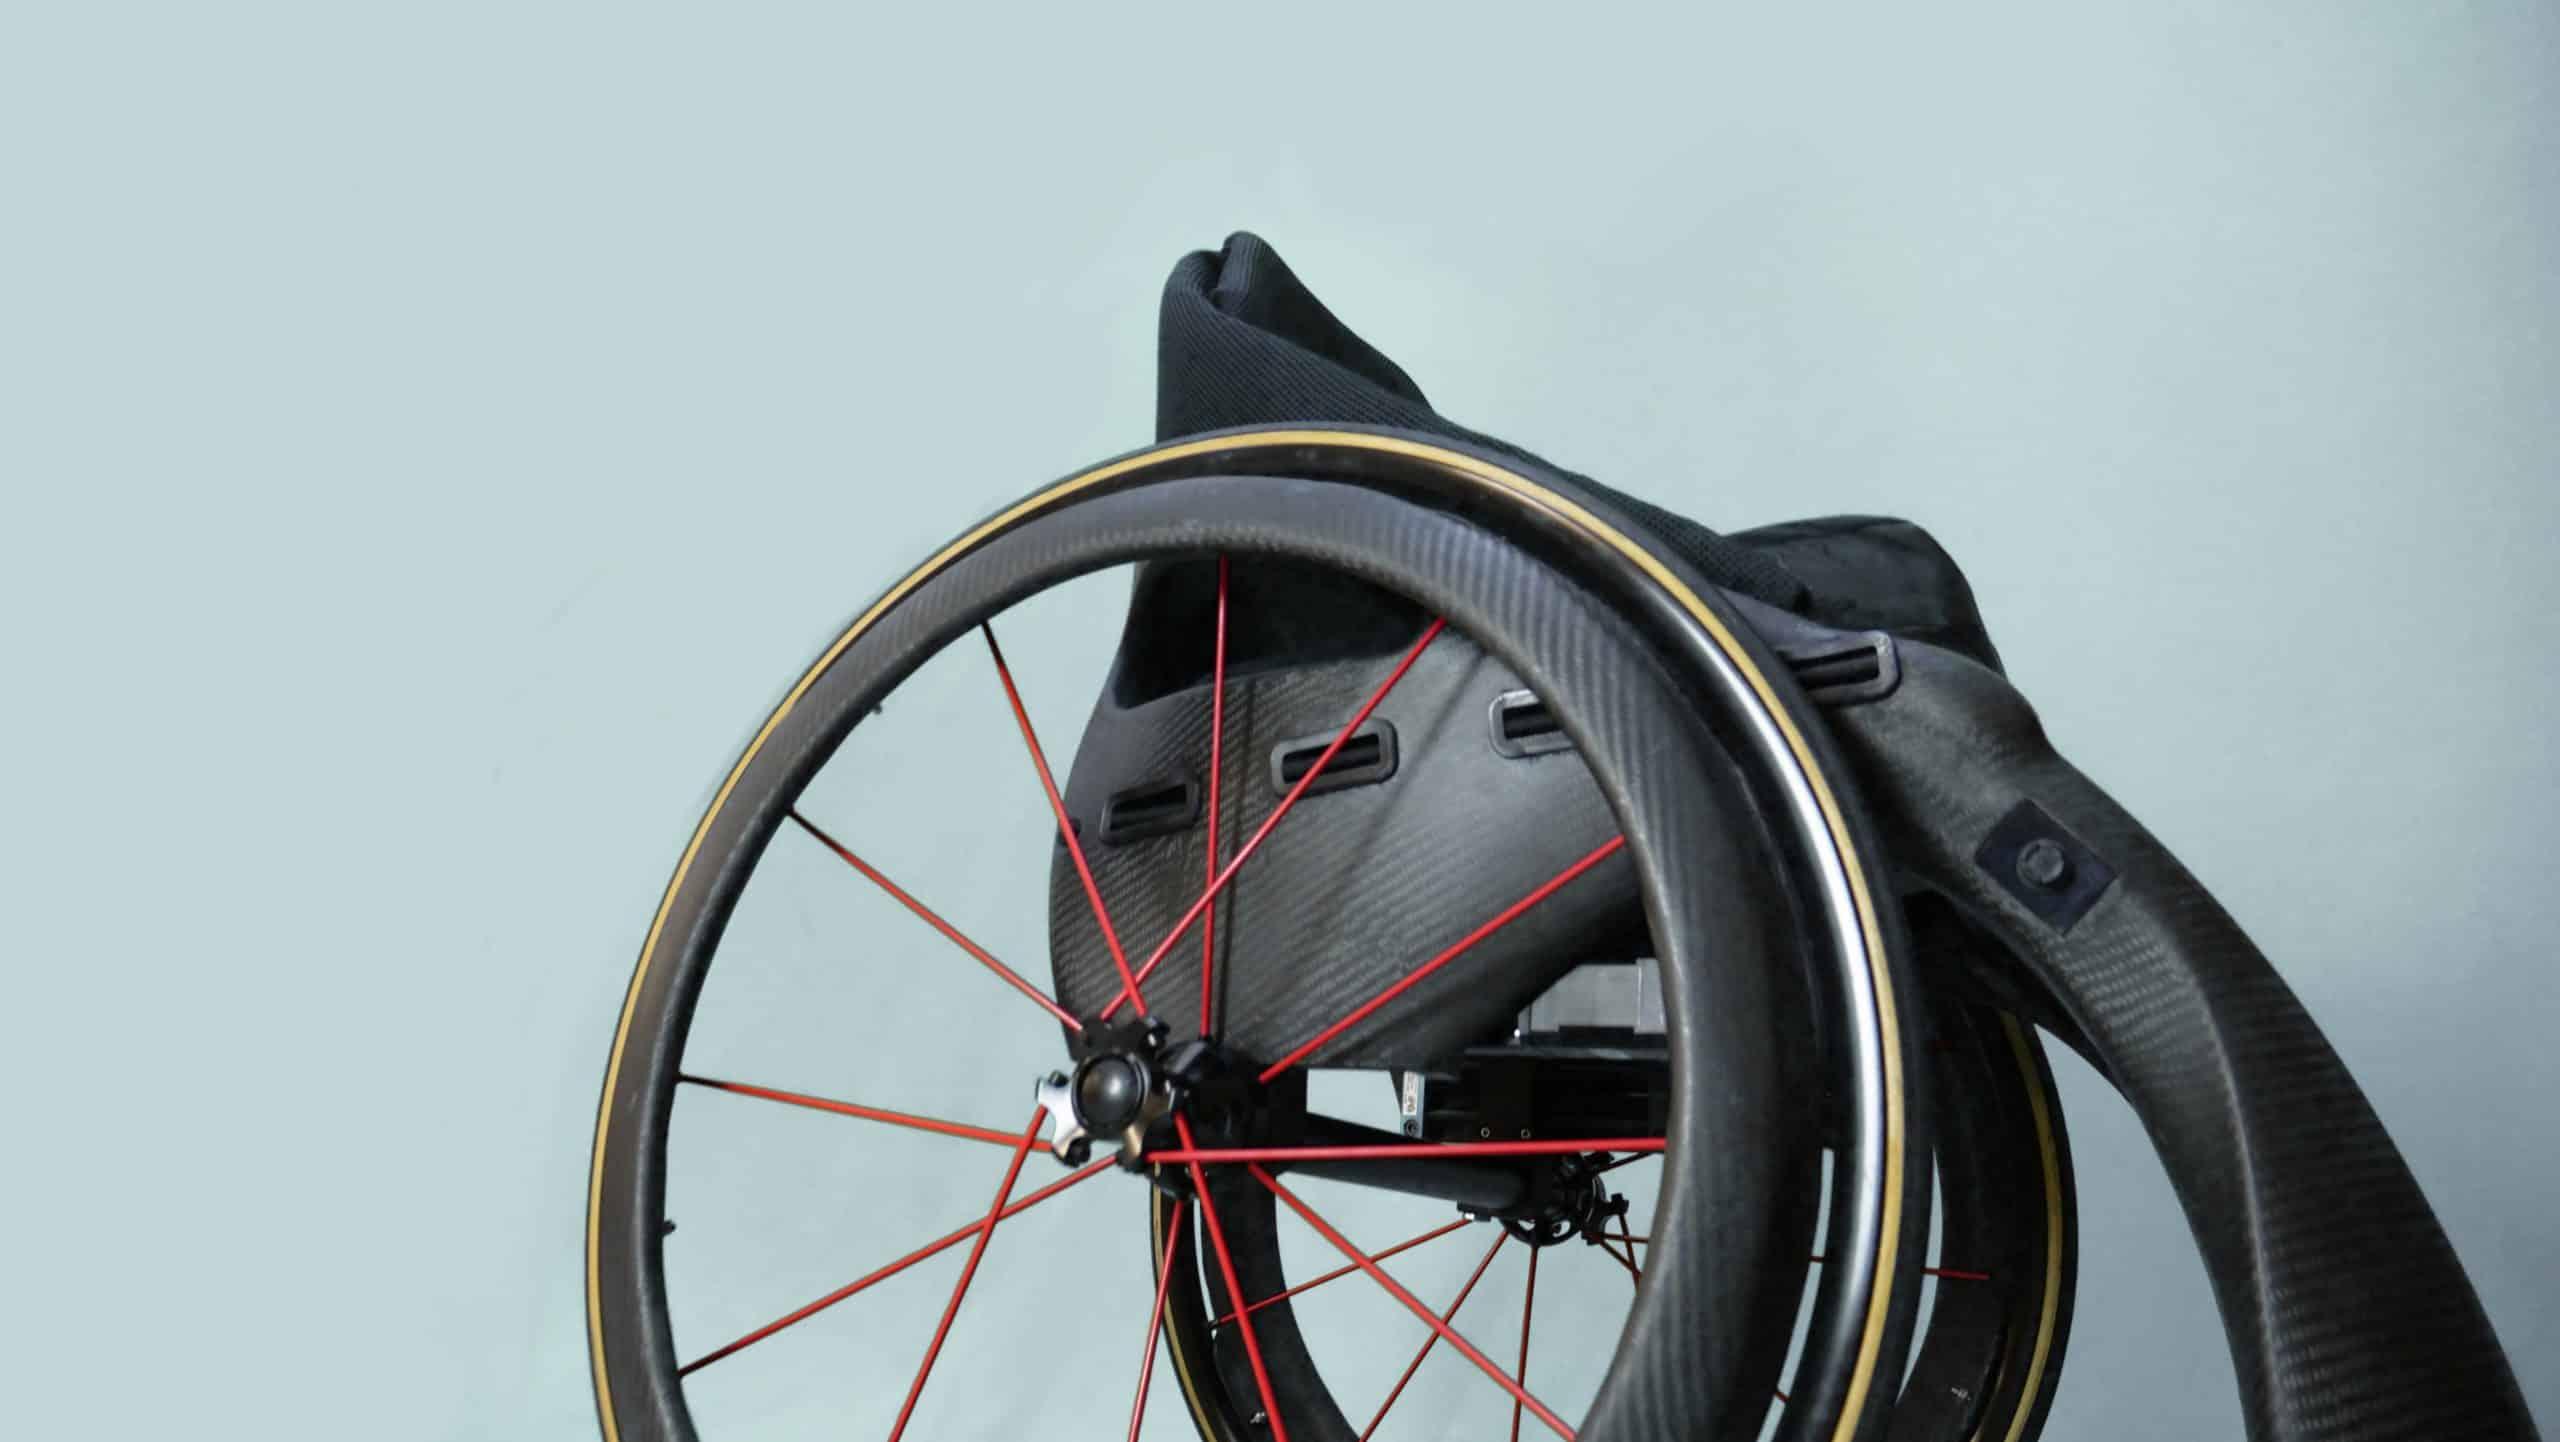 Medical 3D Printing: Smart Wheelchair